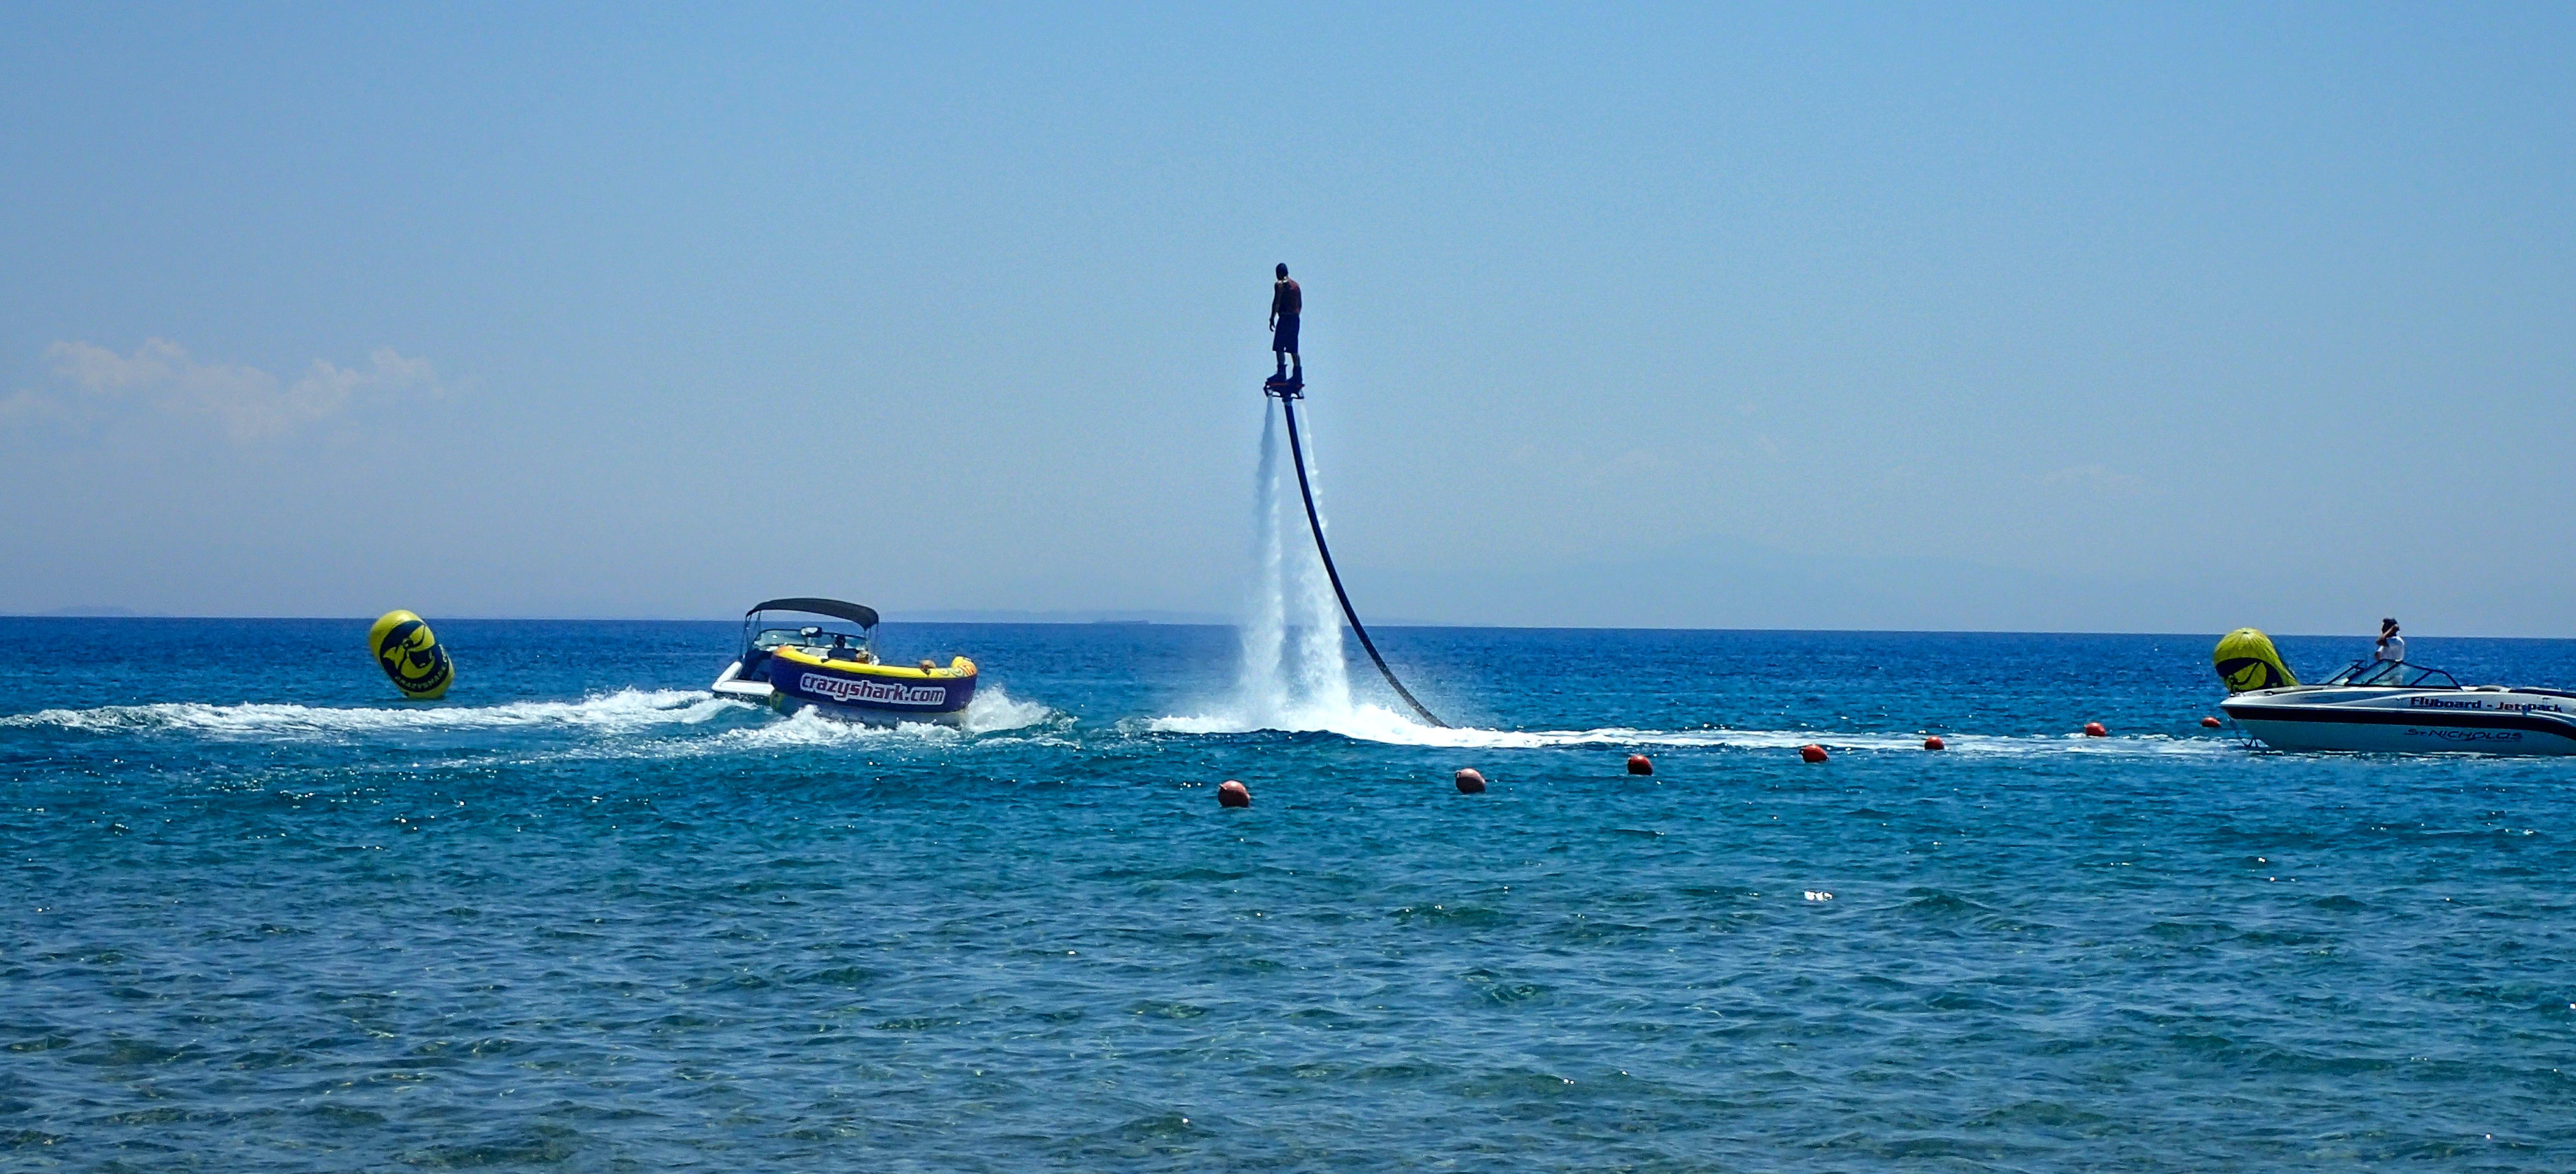 St. Nicholas Beach, Vasilikos, Greece, Adrenaline-pumping Fun